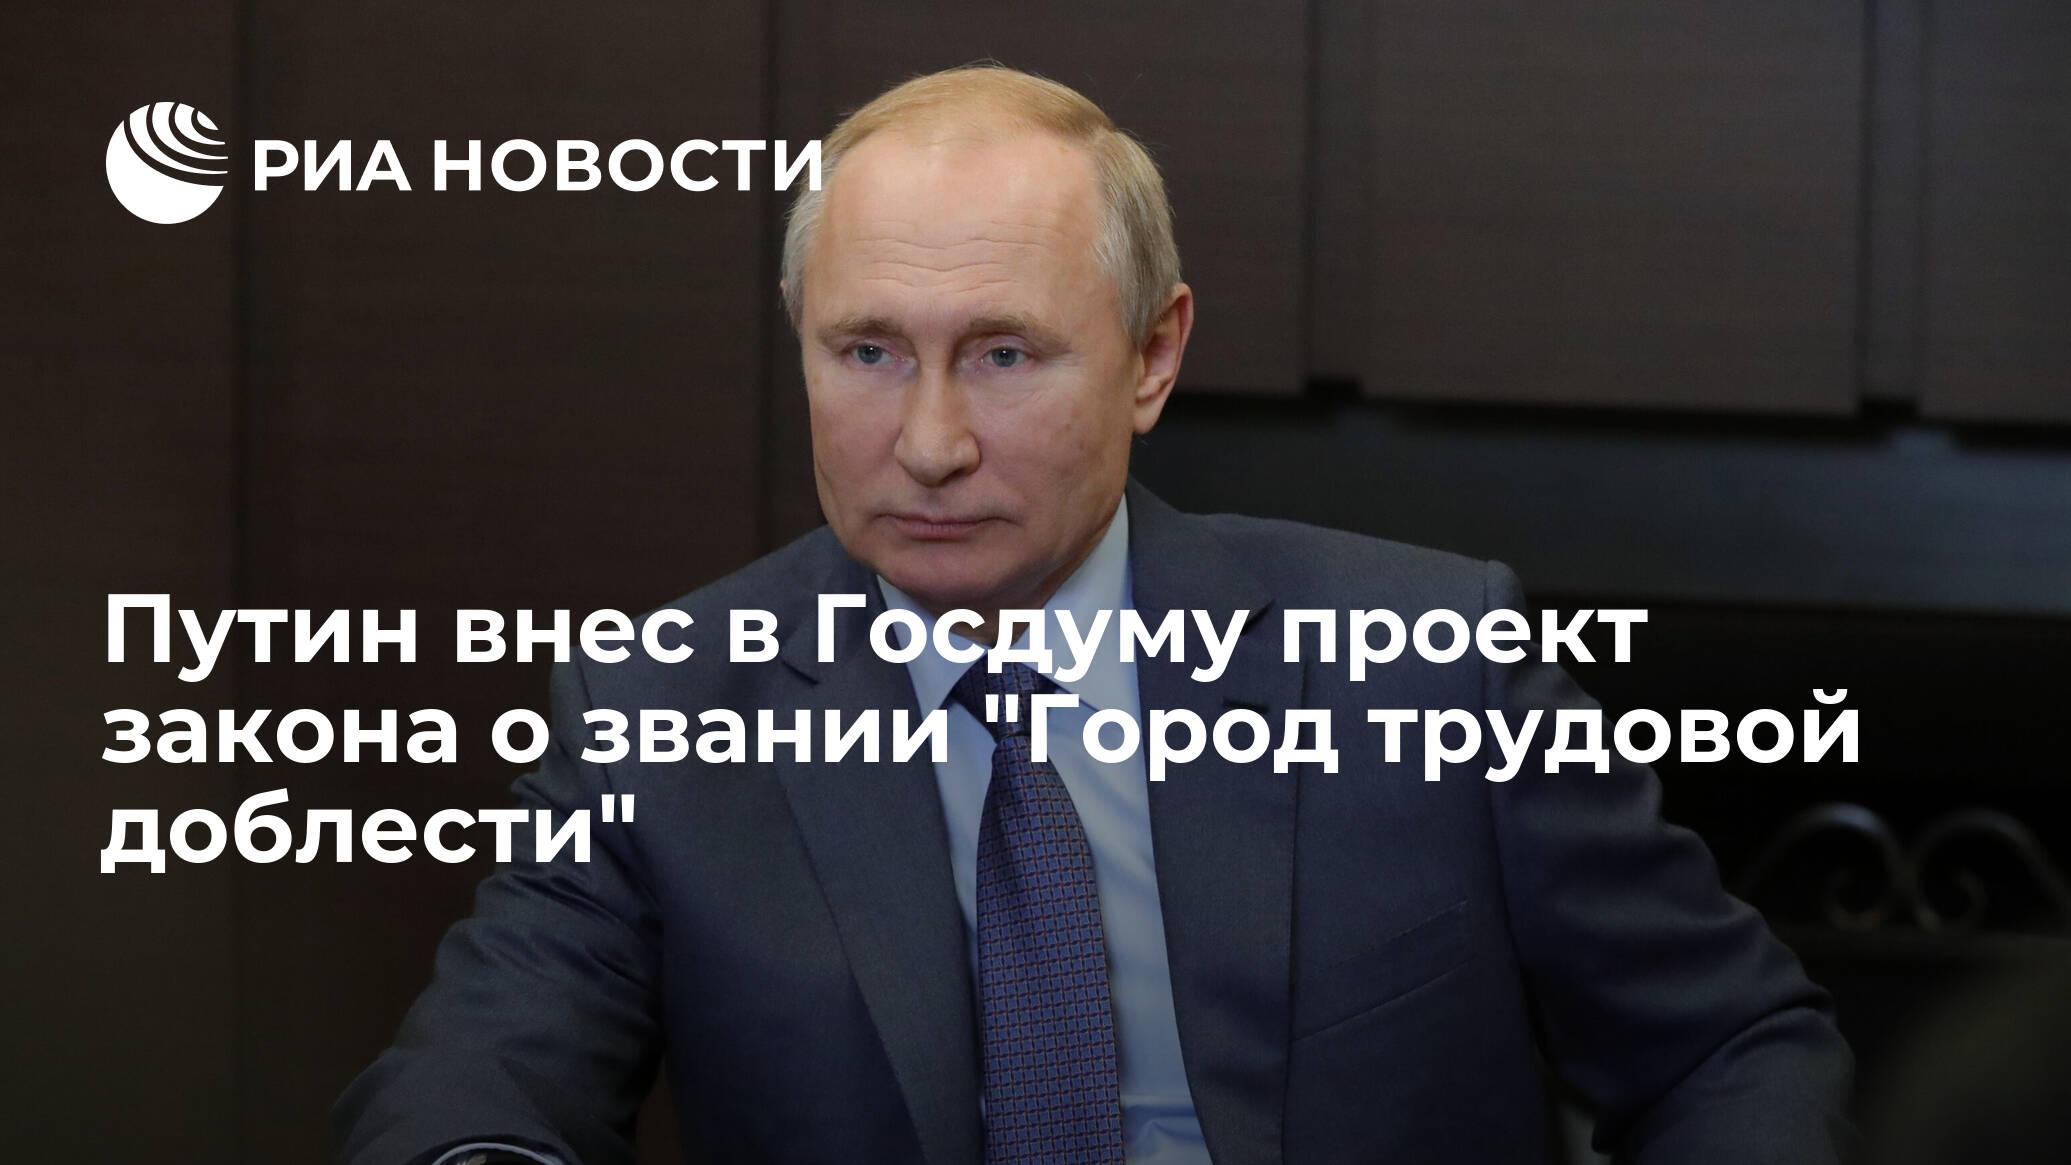 Путин внес в Госдуму проект закона о звании